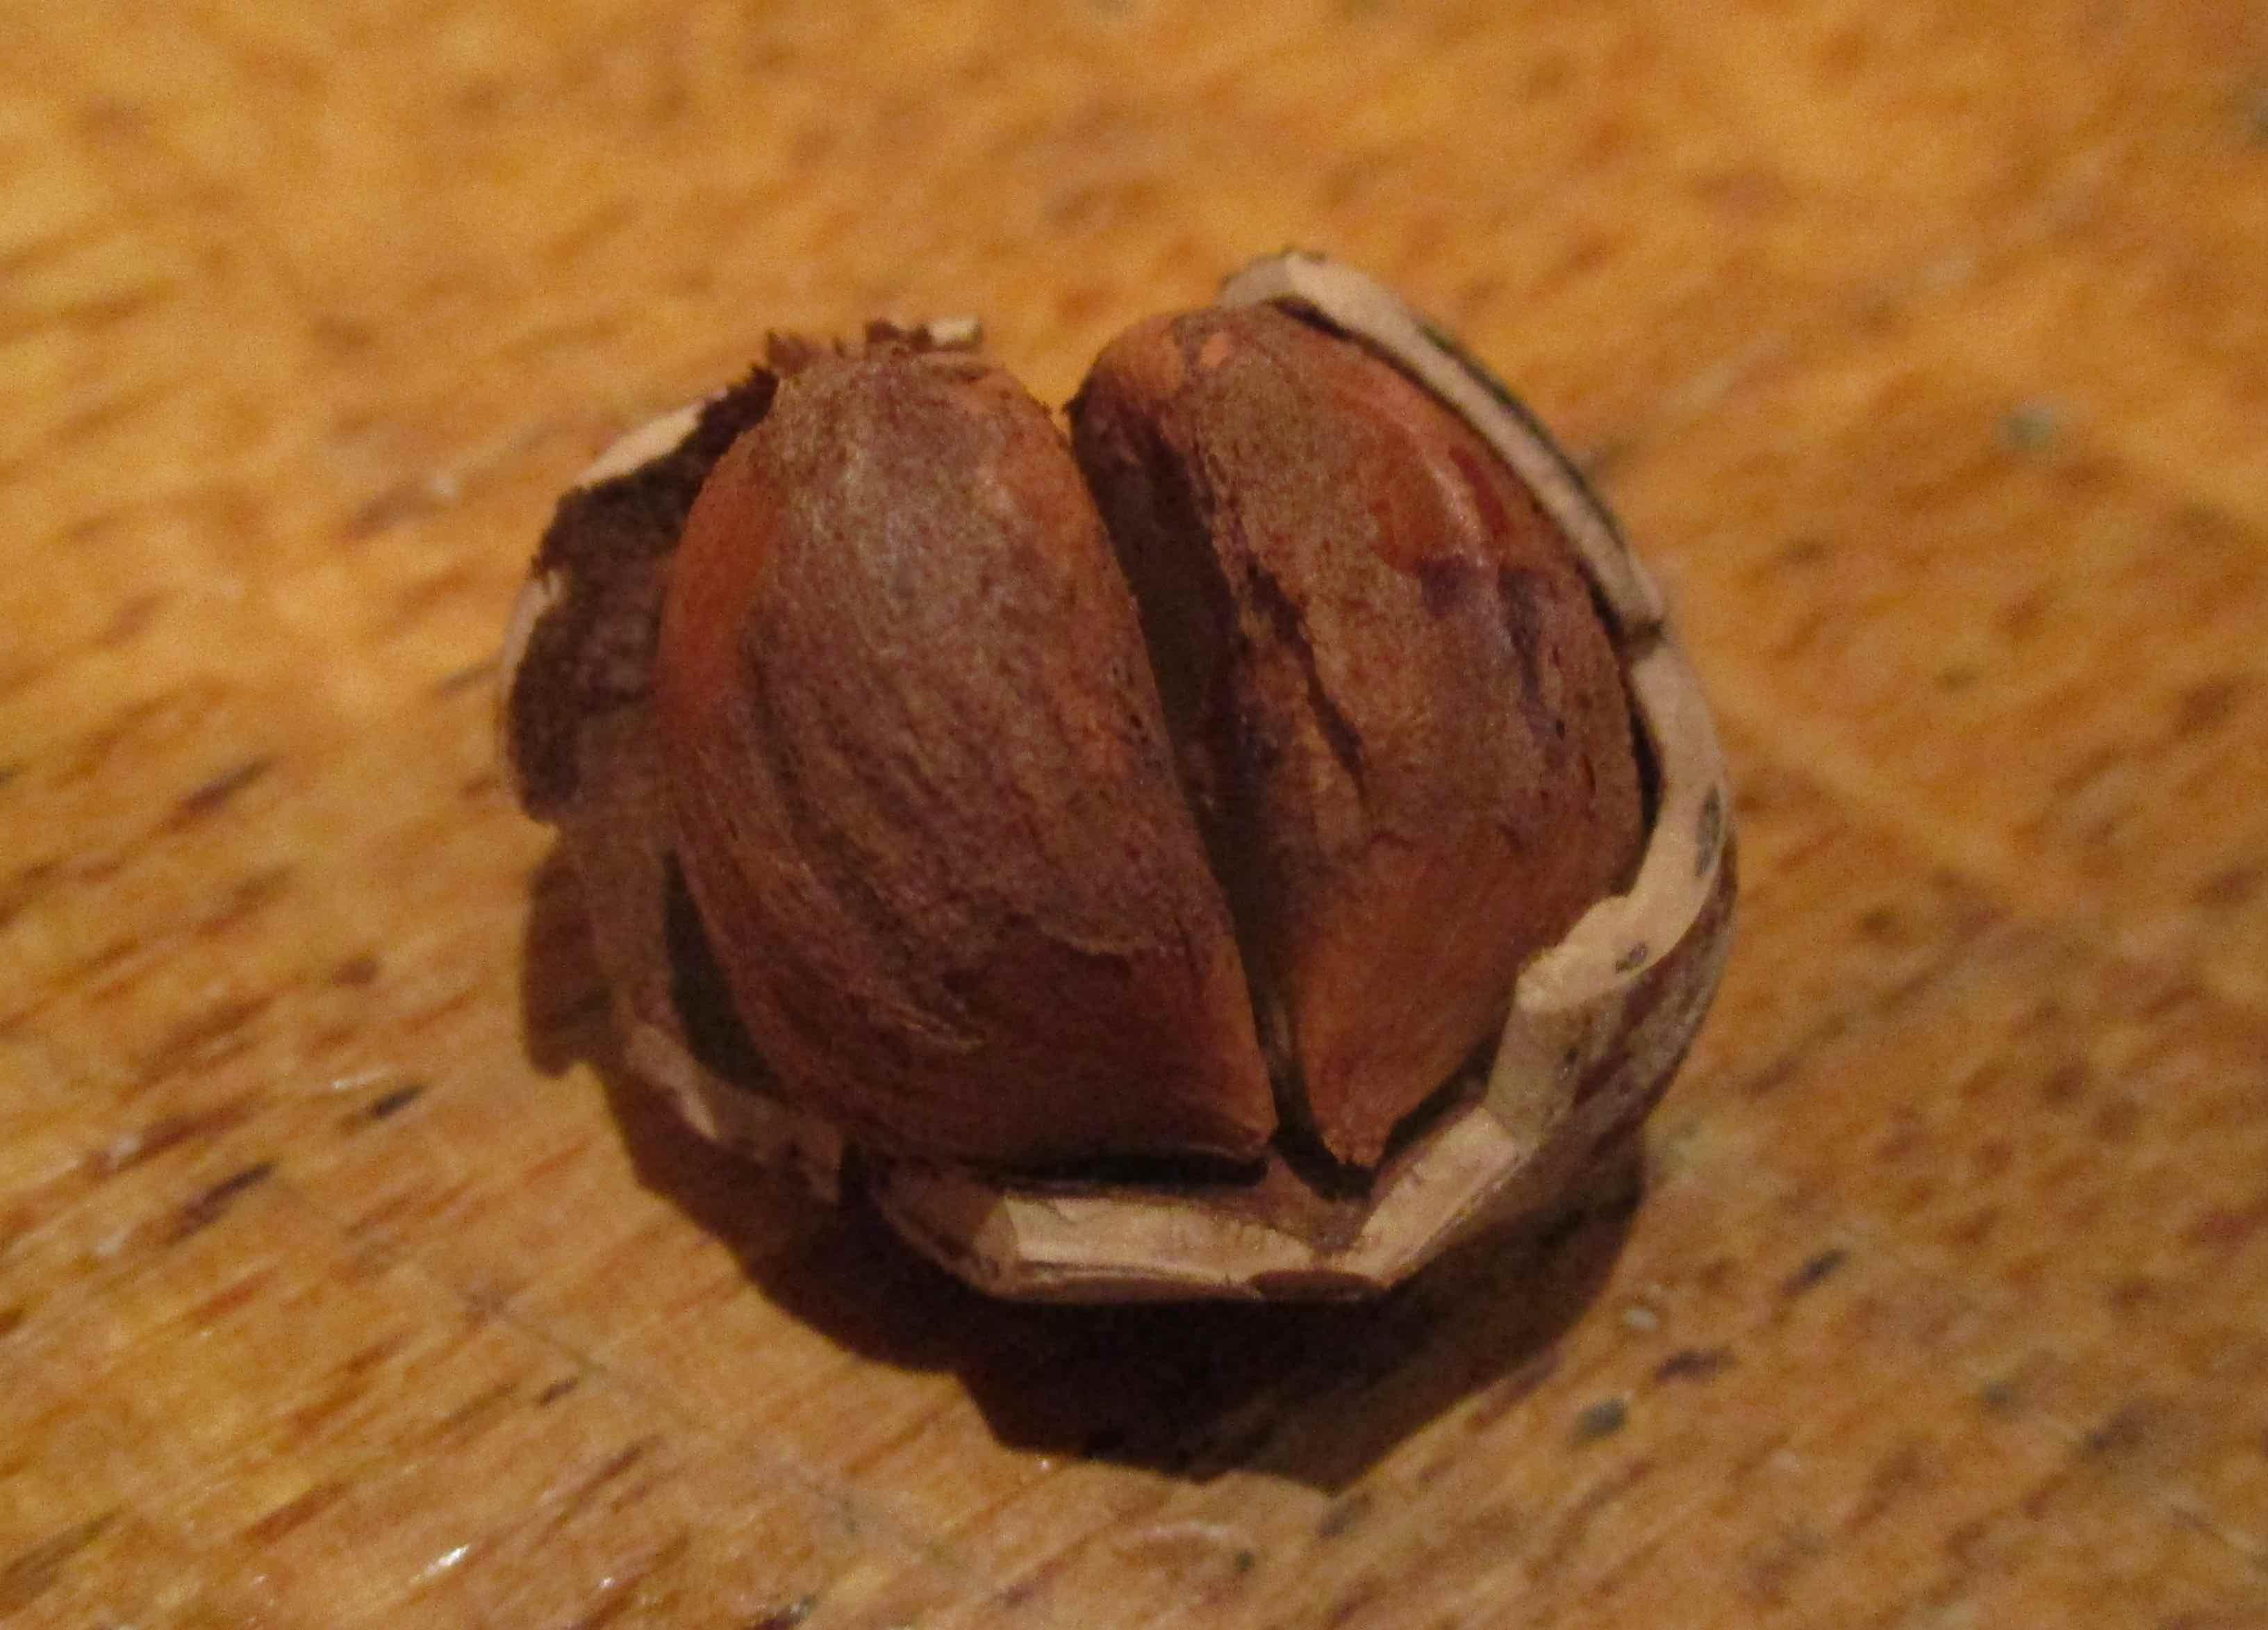 philippine noisette